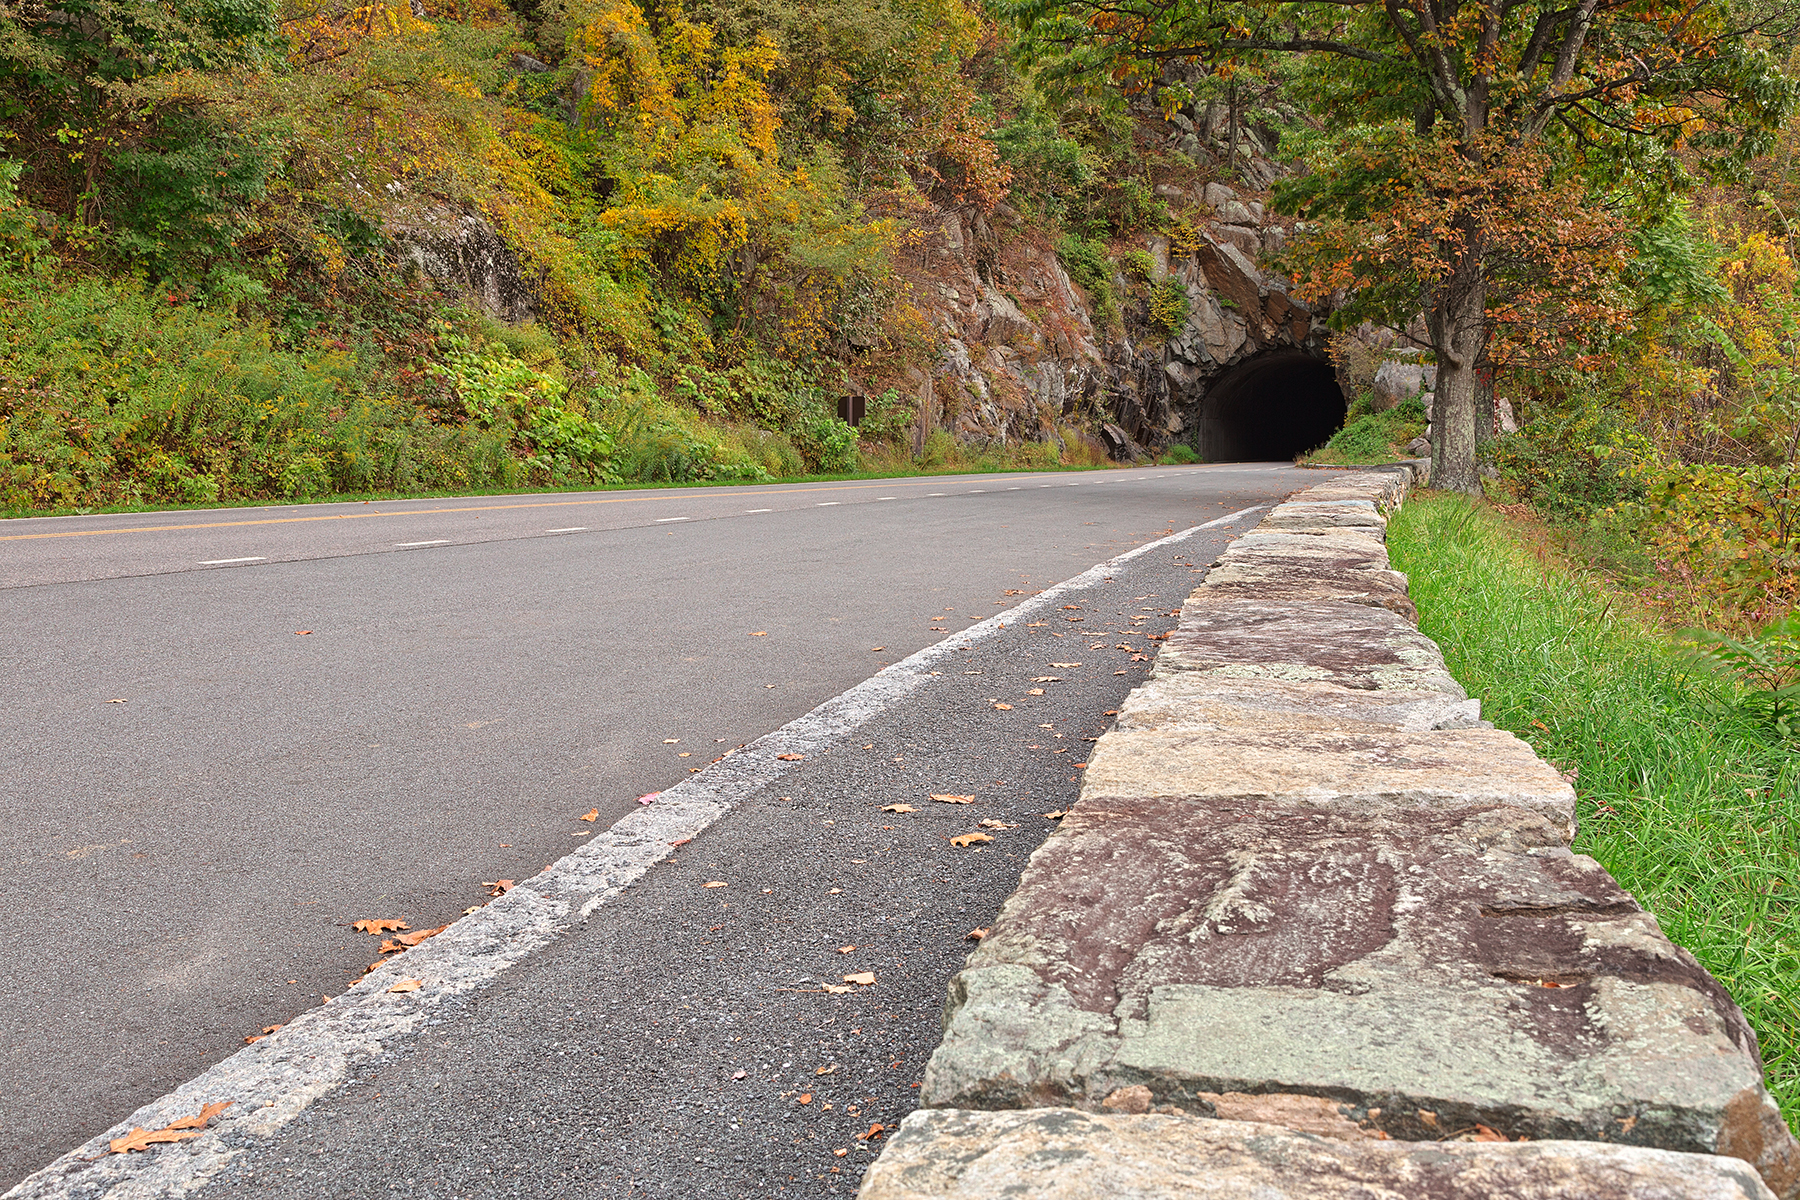 Skyline tunnel drive - hdr photo